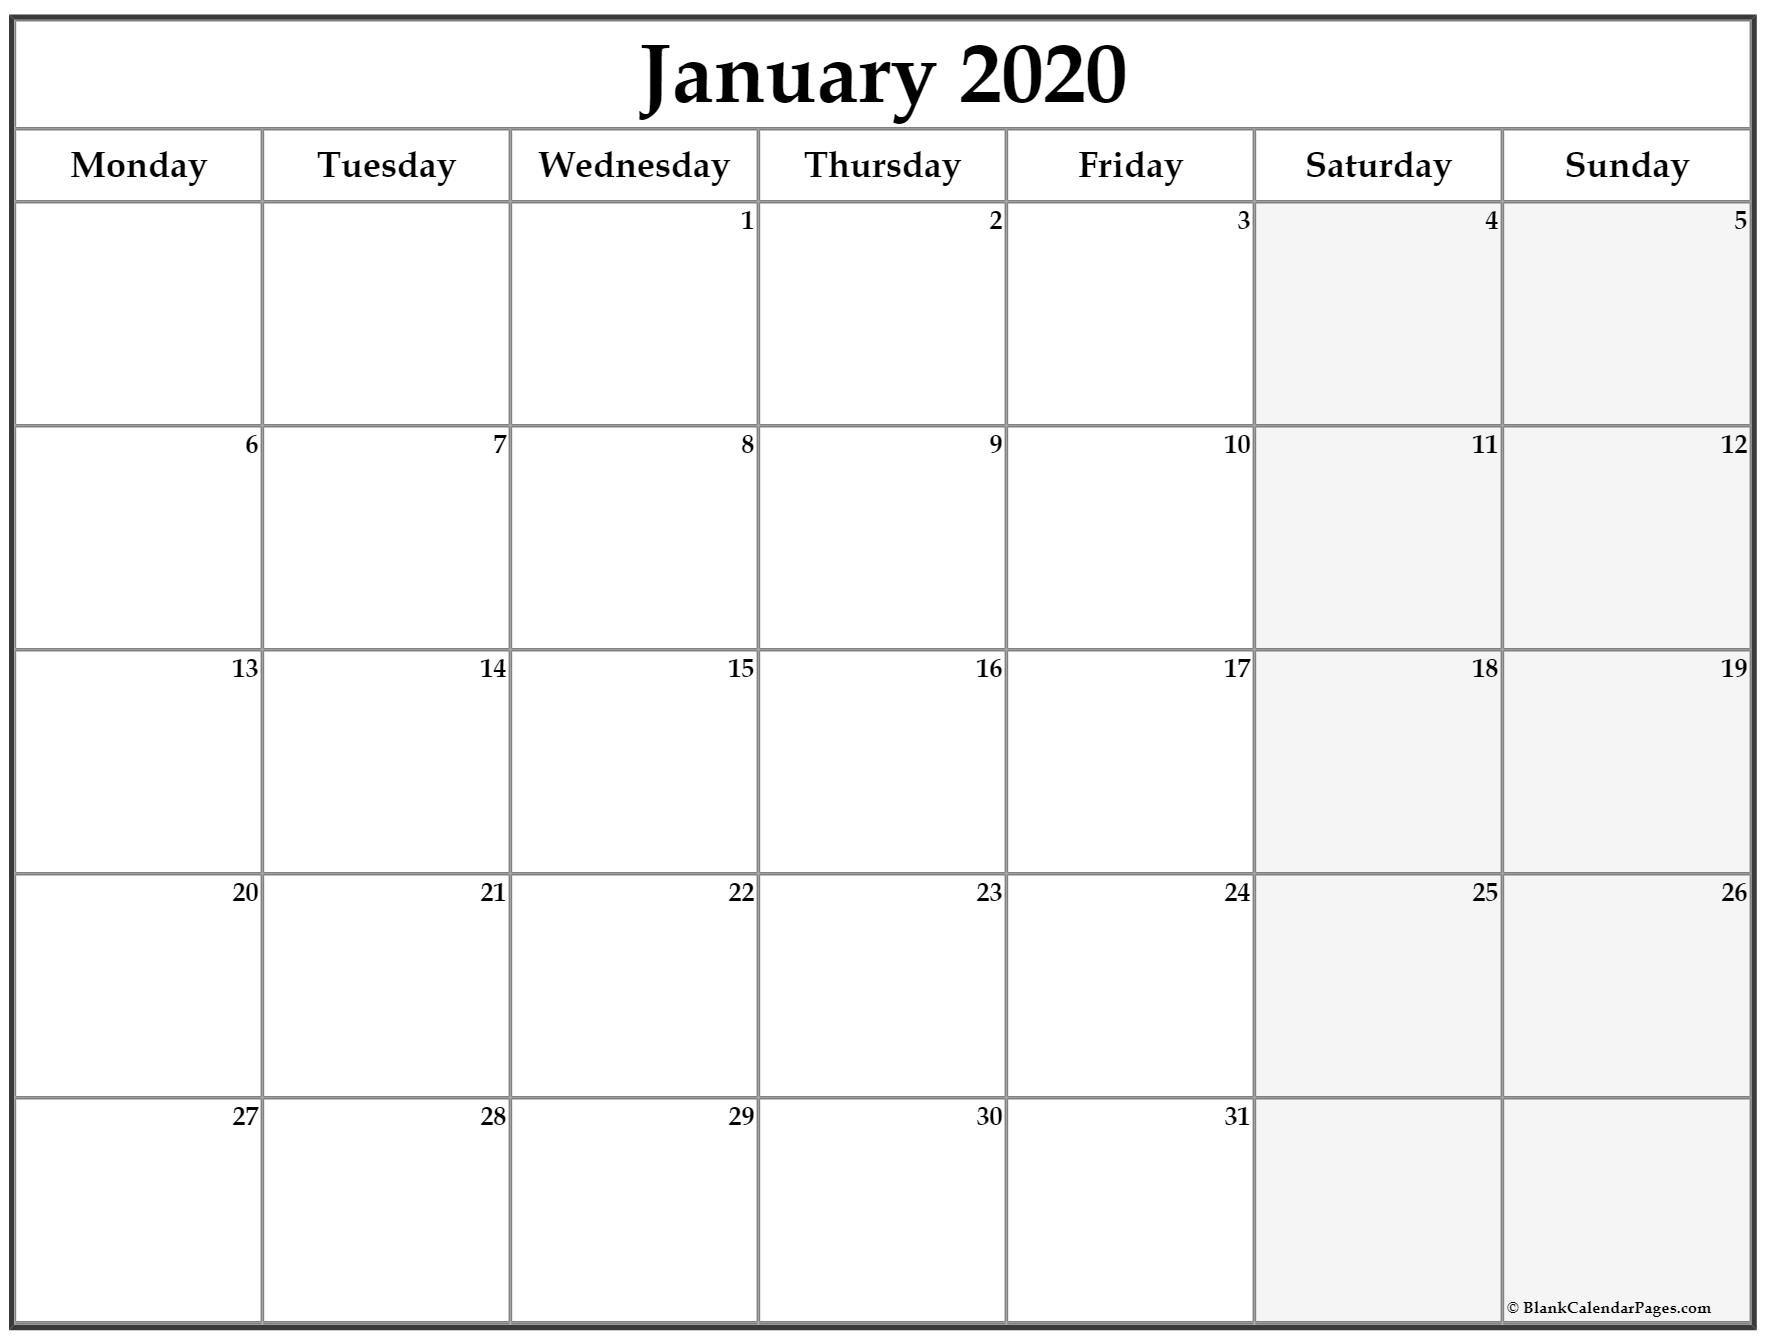 January 2020 Monday Calendar | Monday To Sunday Free Printable Monday Thru Sunday Calendars